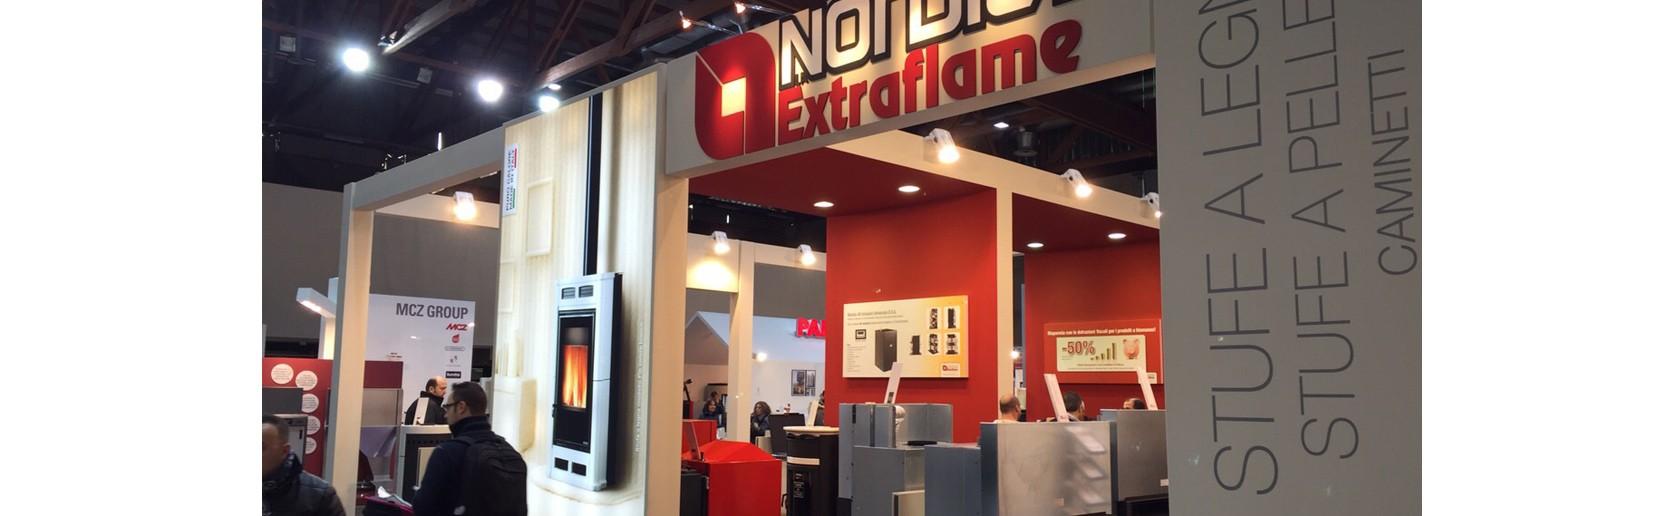 Italia legno energia 2015 la nordica extraflame for Italia legno energia